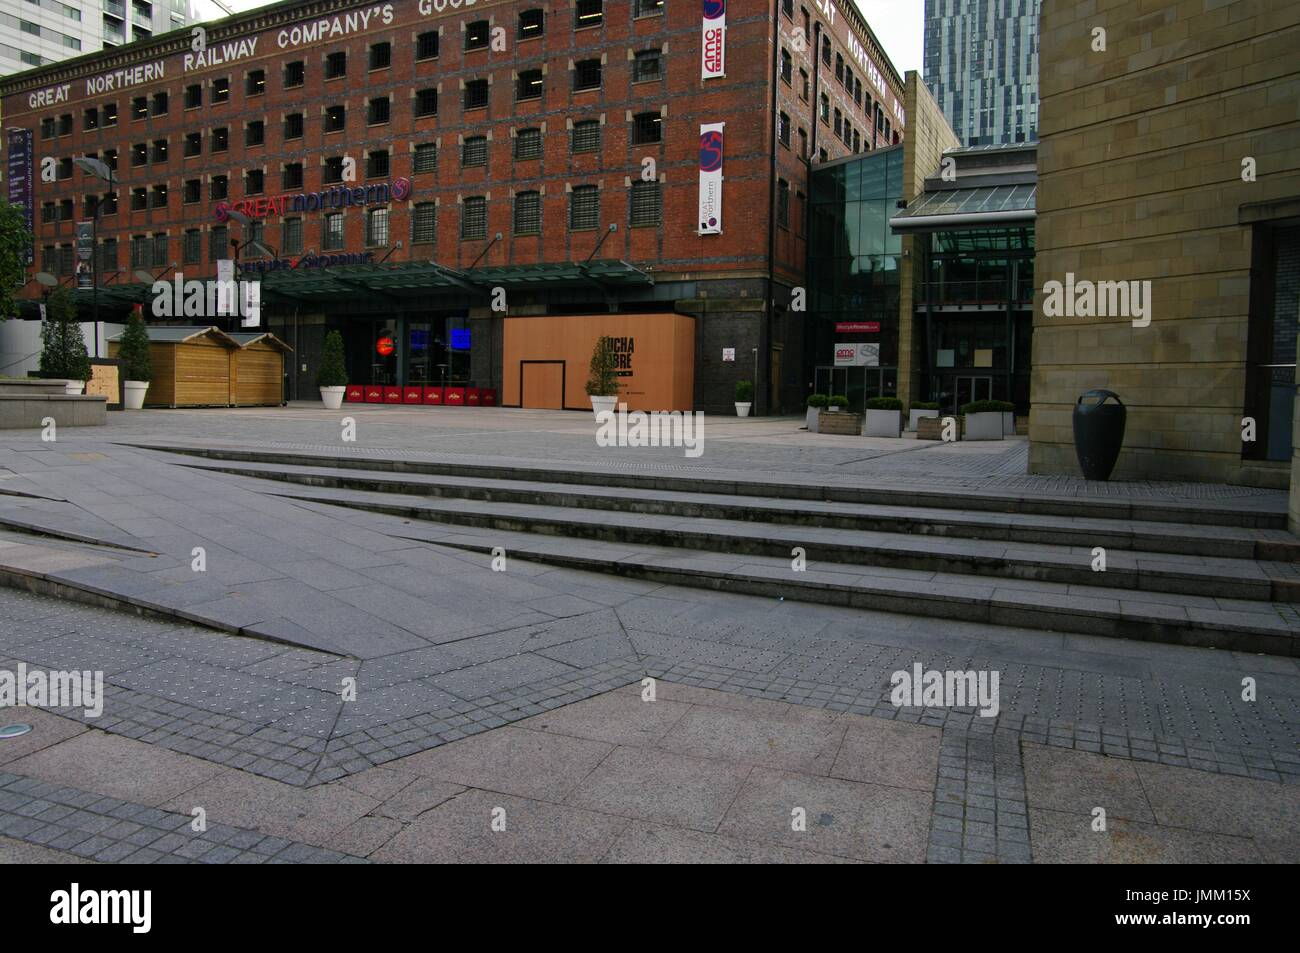 Manchester, United Kingdom - Stock Image